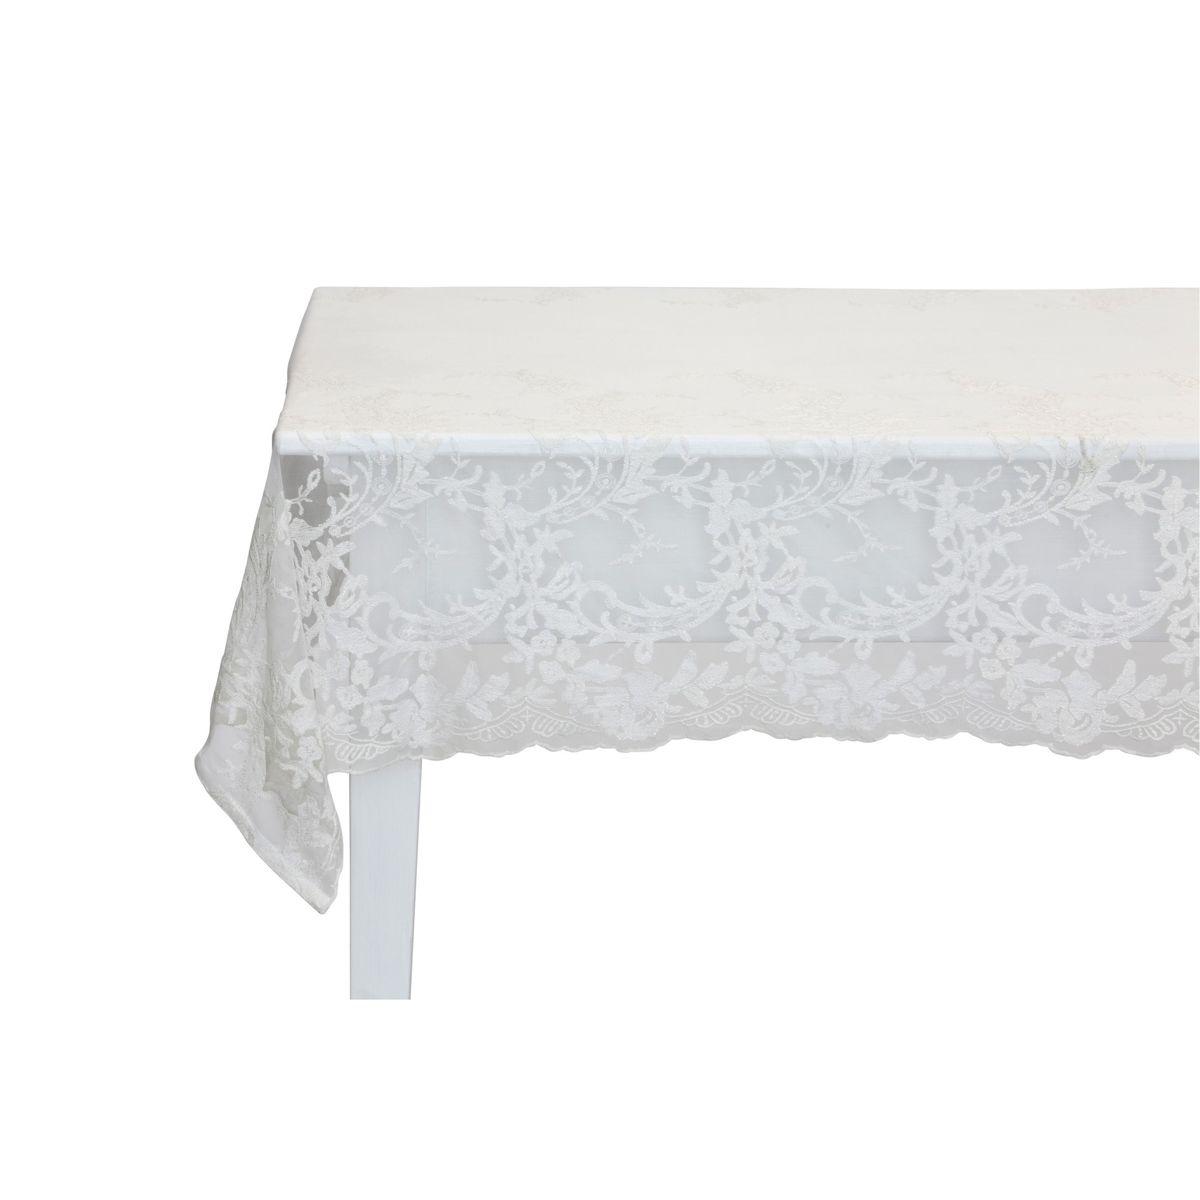 Obrus Juliette Emb Tablecloth 320 X 150 Cm Item 517233019 Lene Bjerre